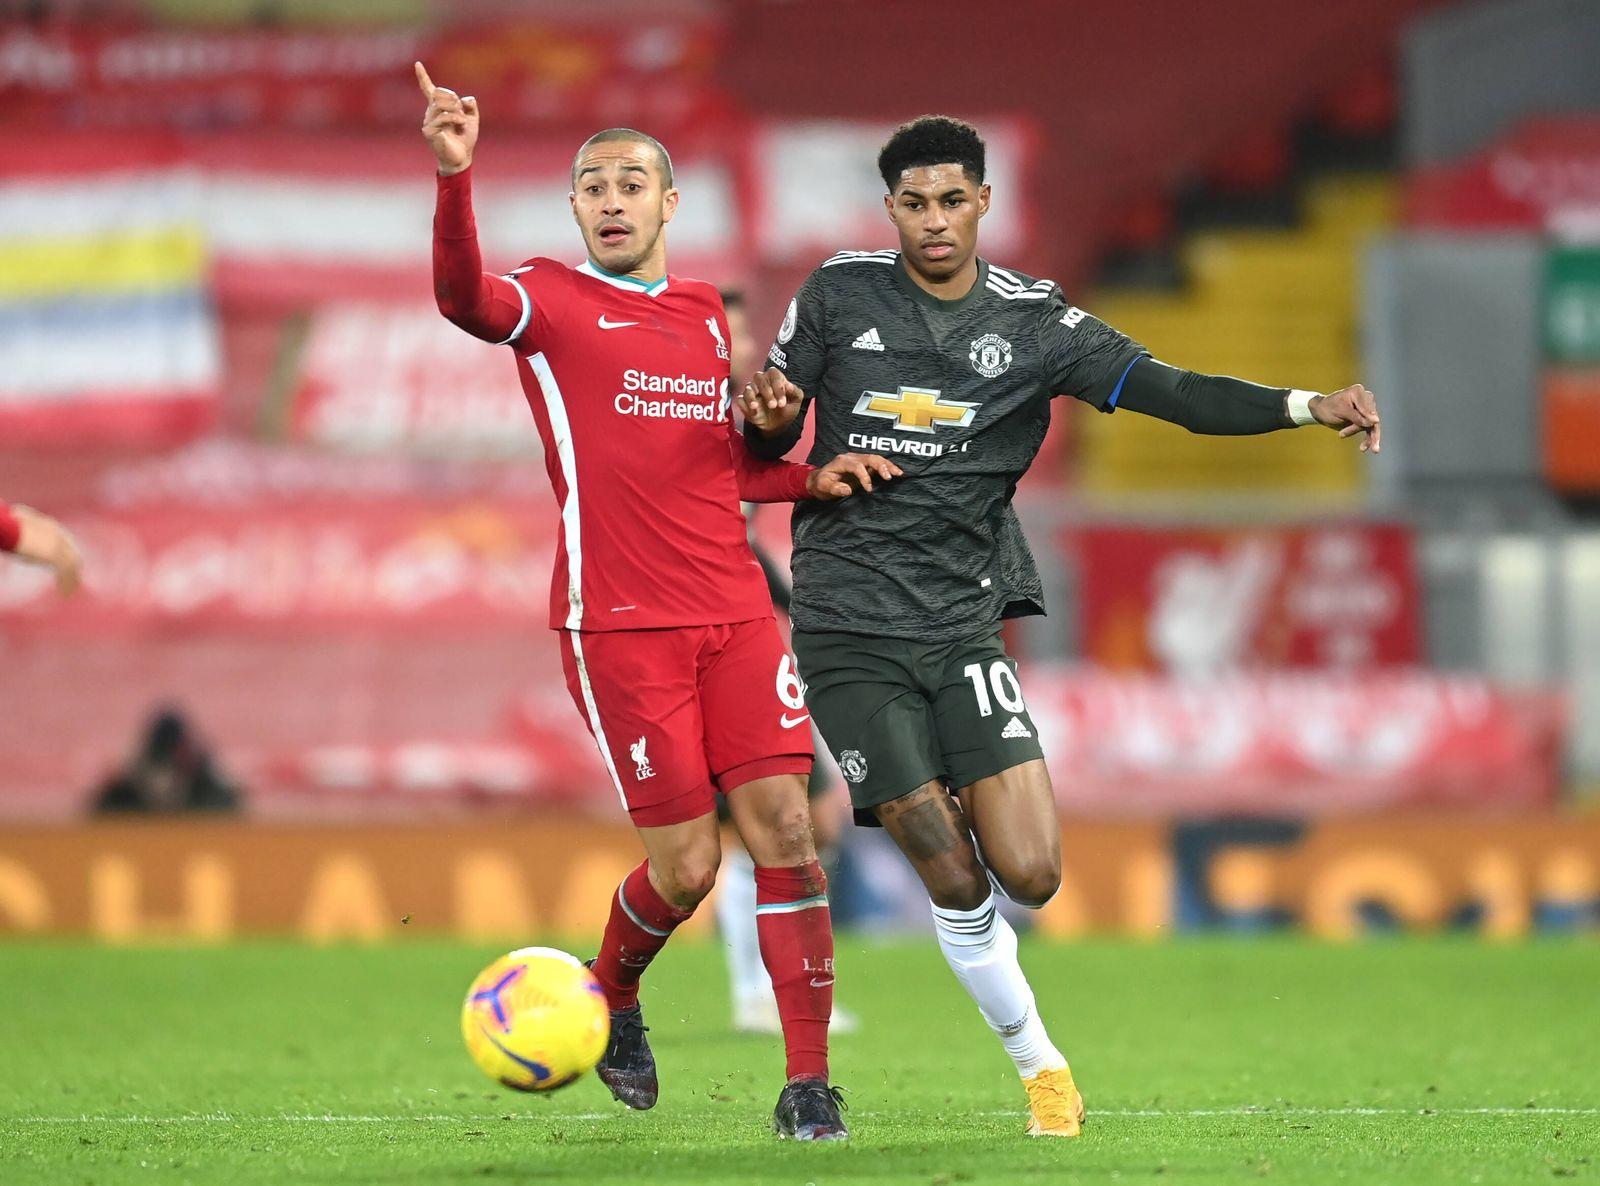 Liverpool v Manchester United, ManU - Premier League - Anfield Liverpool s Thiago Alcantara (left) and Manchester Unite